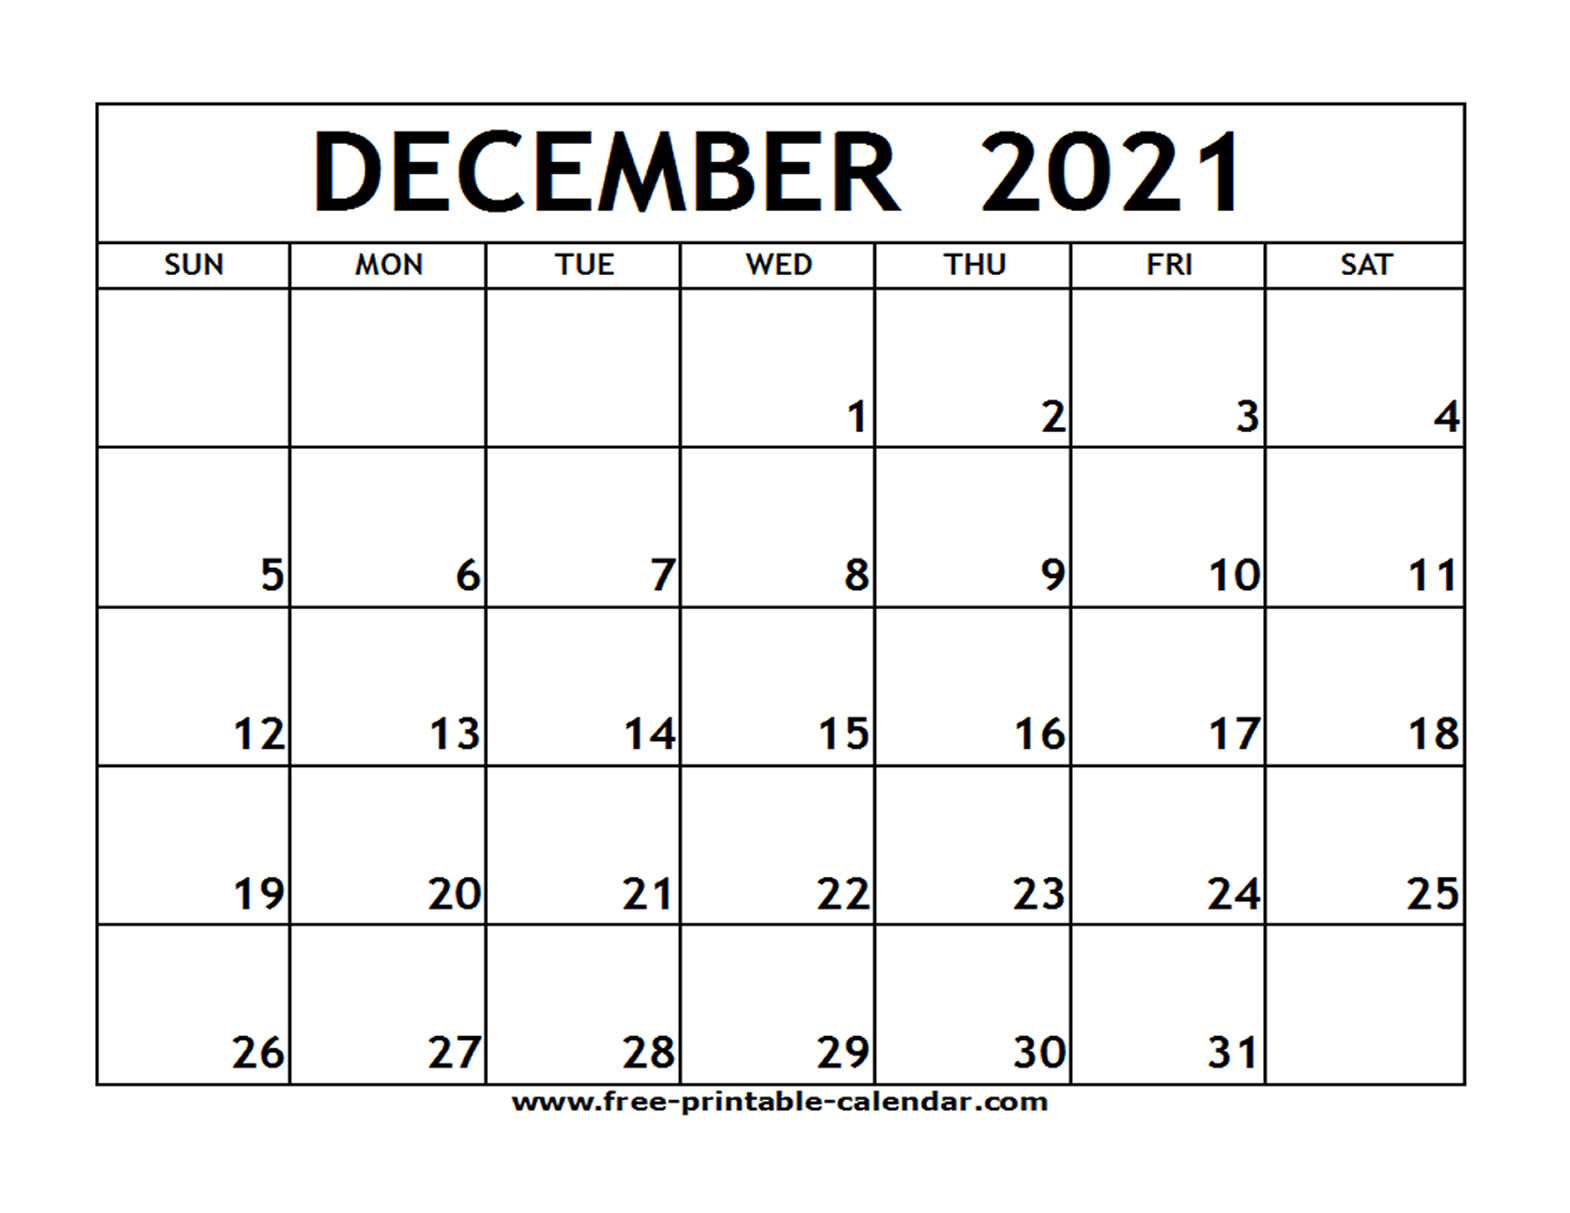 Dec 2021 Printable Calendar | Free Printable Calendar